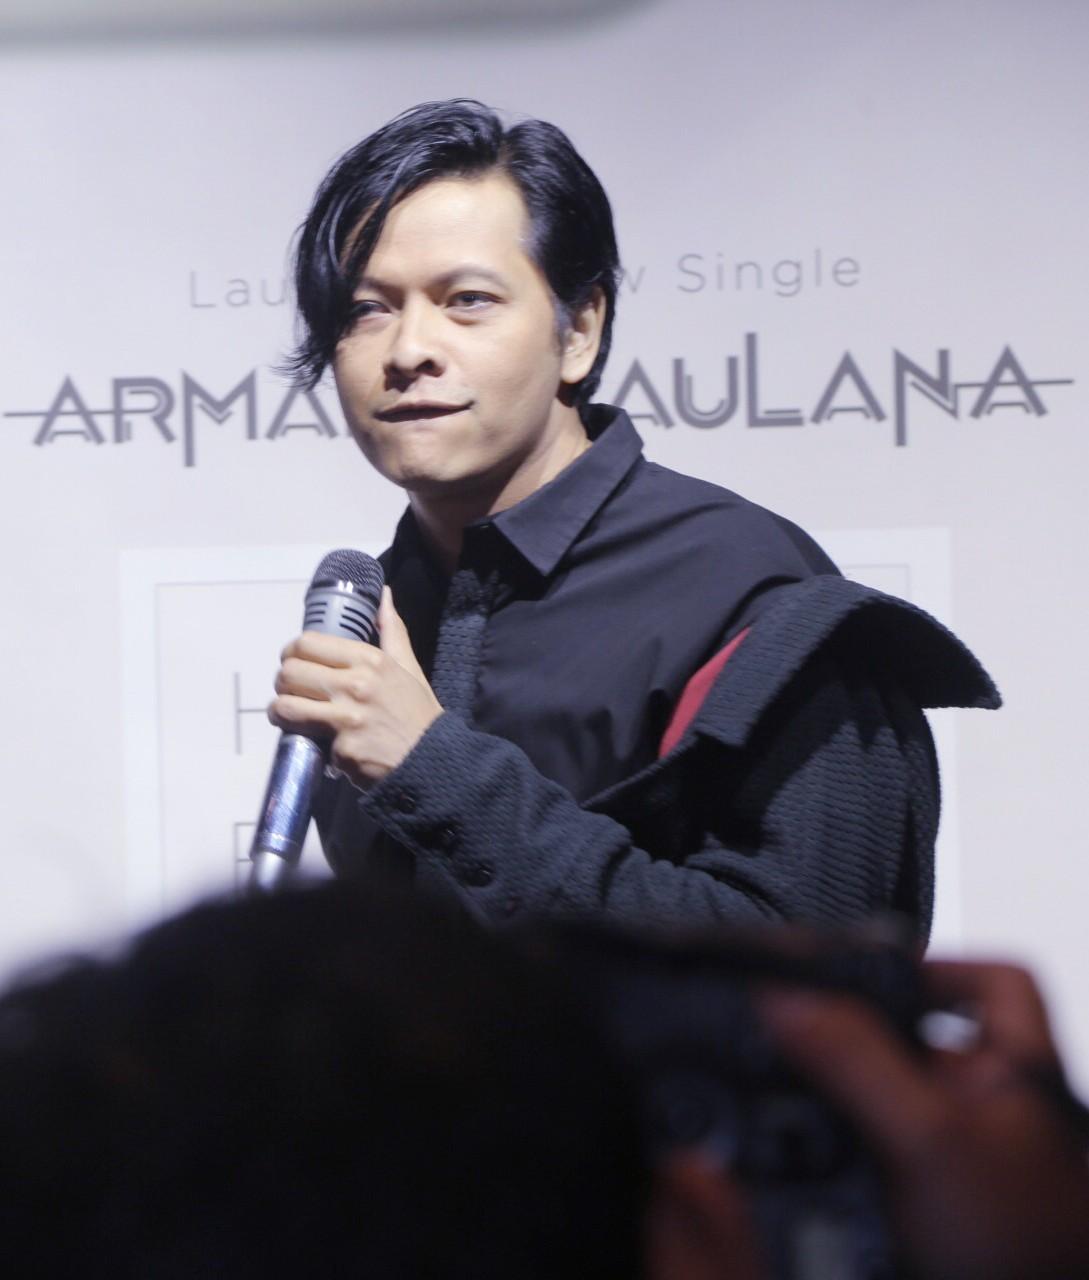 'ARANA Project' is Armand Maulana New Project